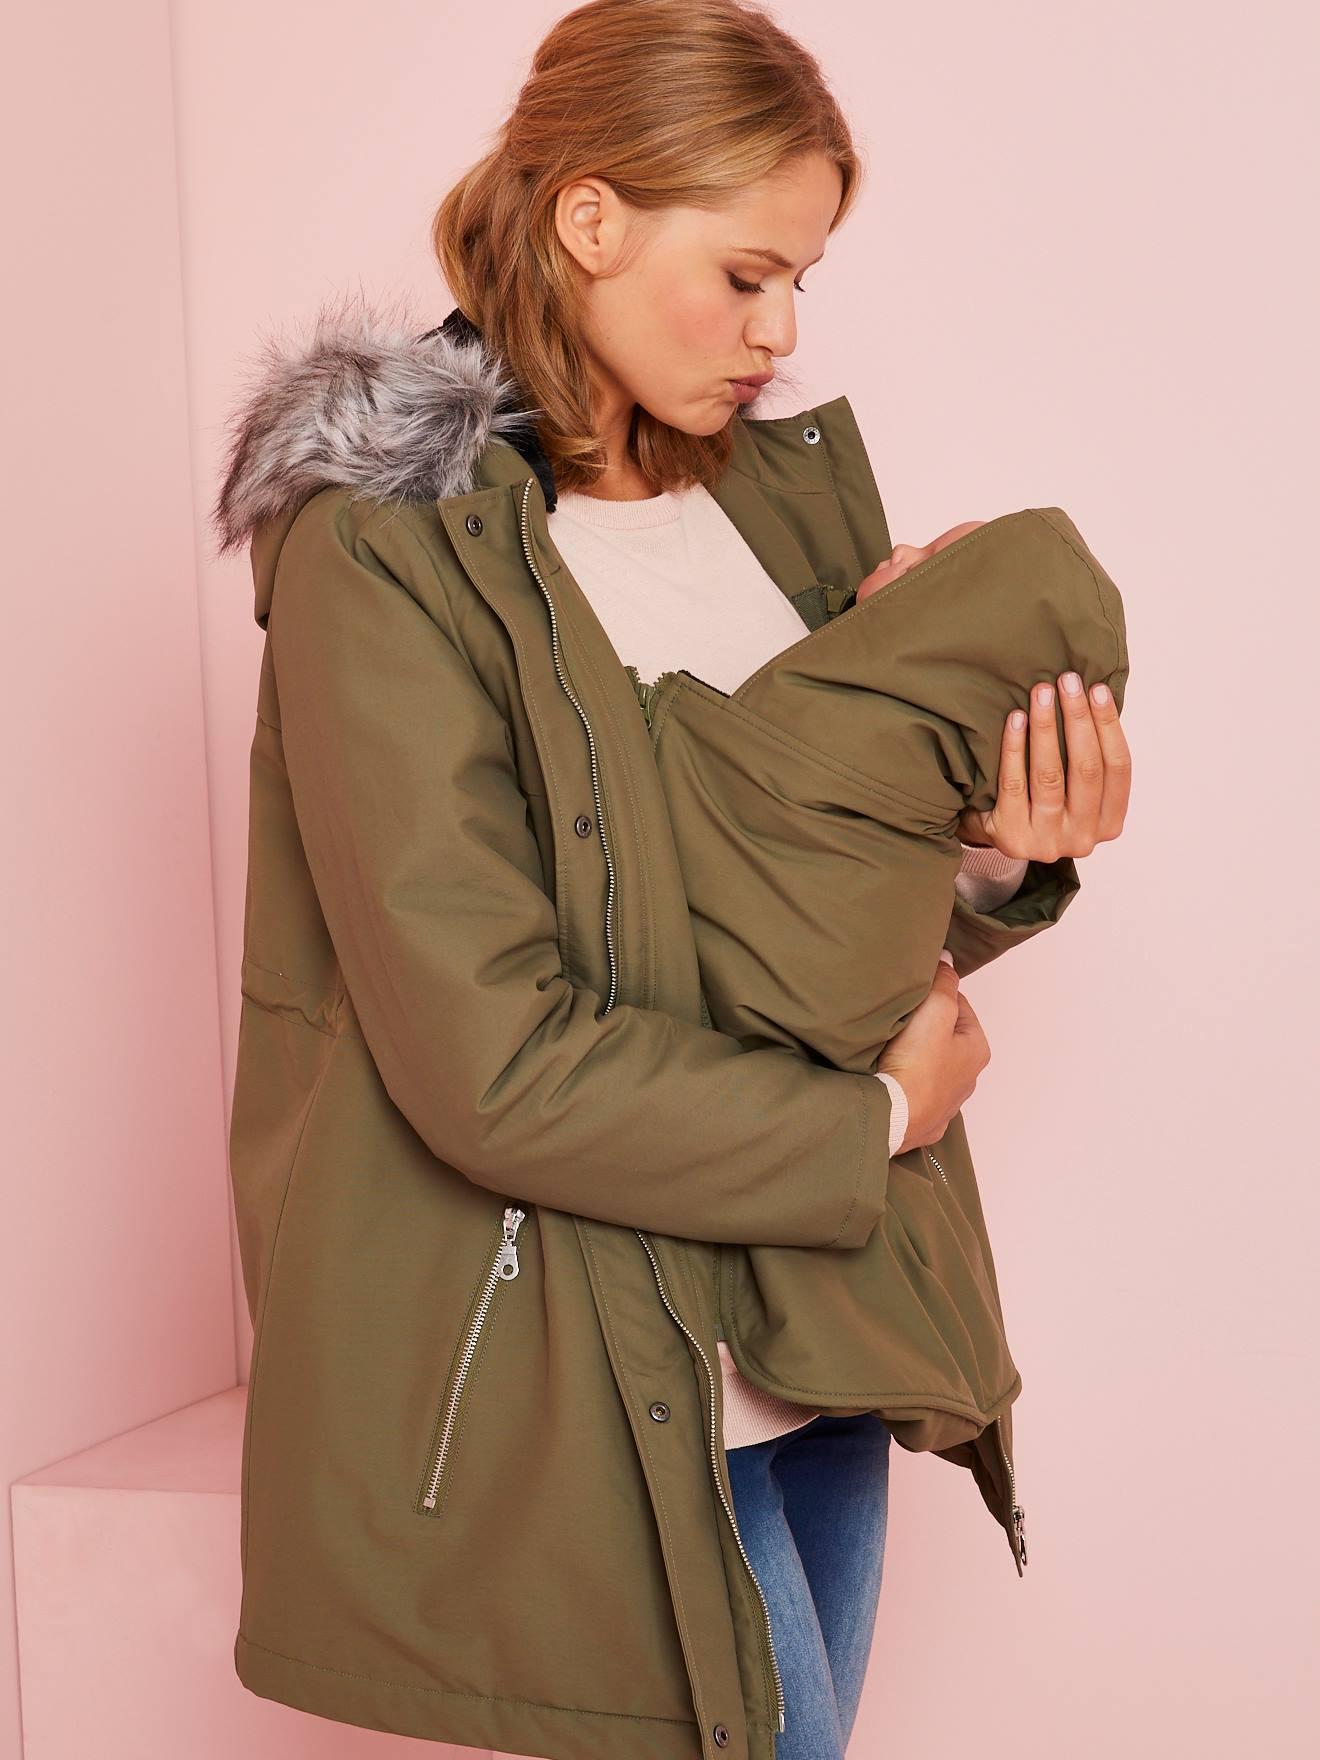 Autumn Winter Maternity Coat Maternity Clothing jacket